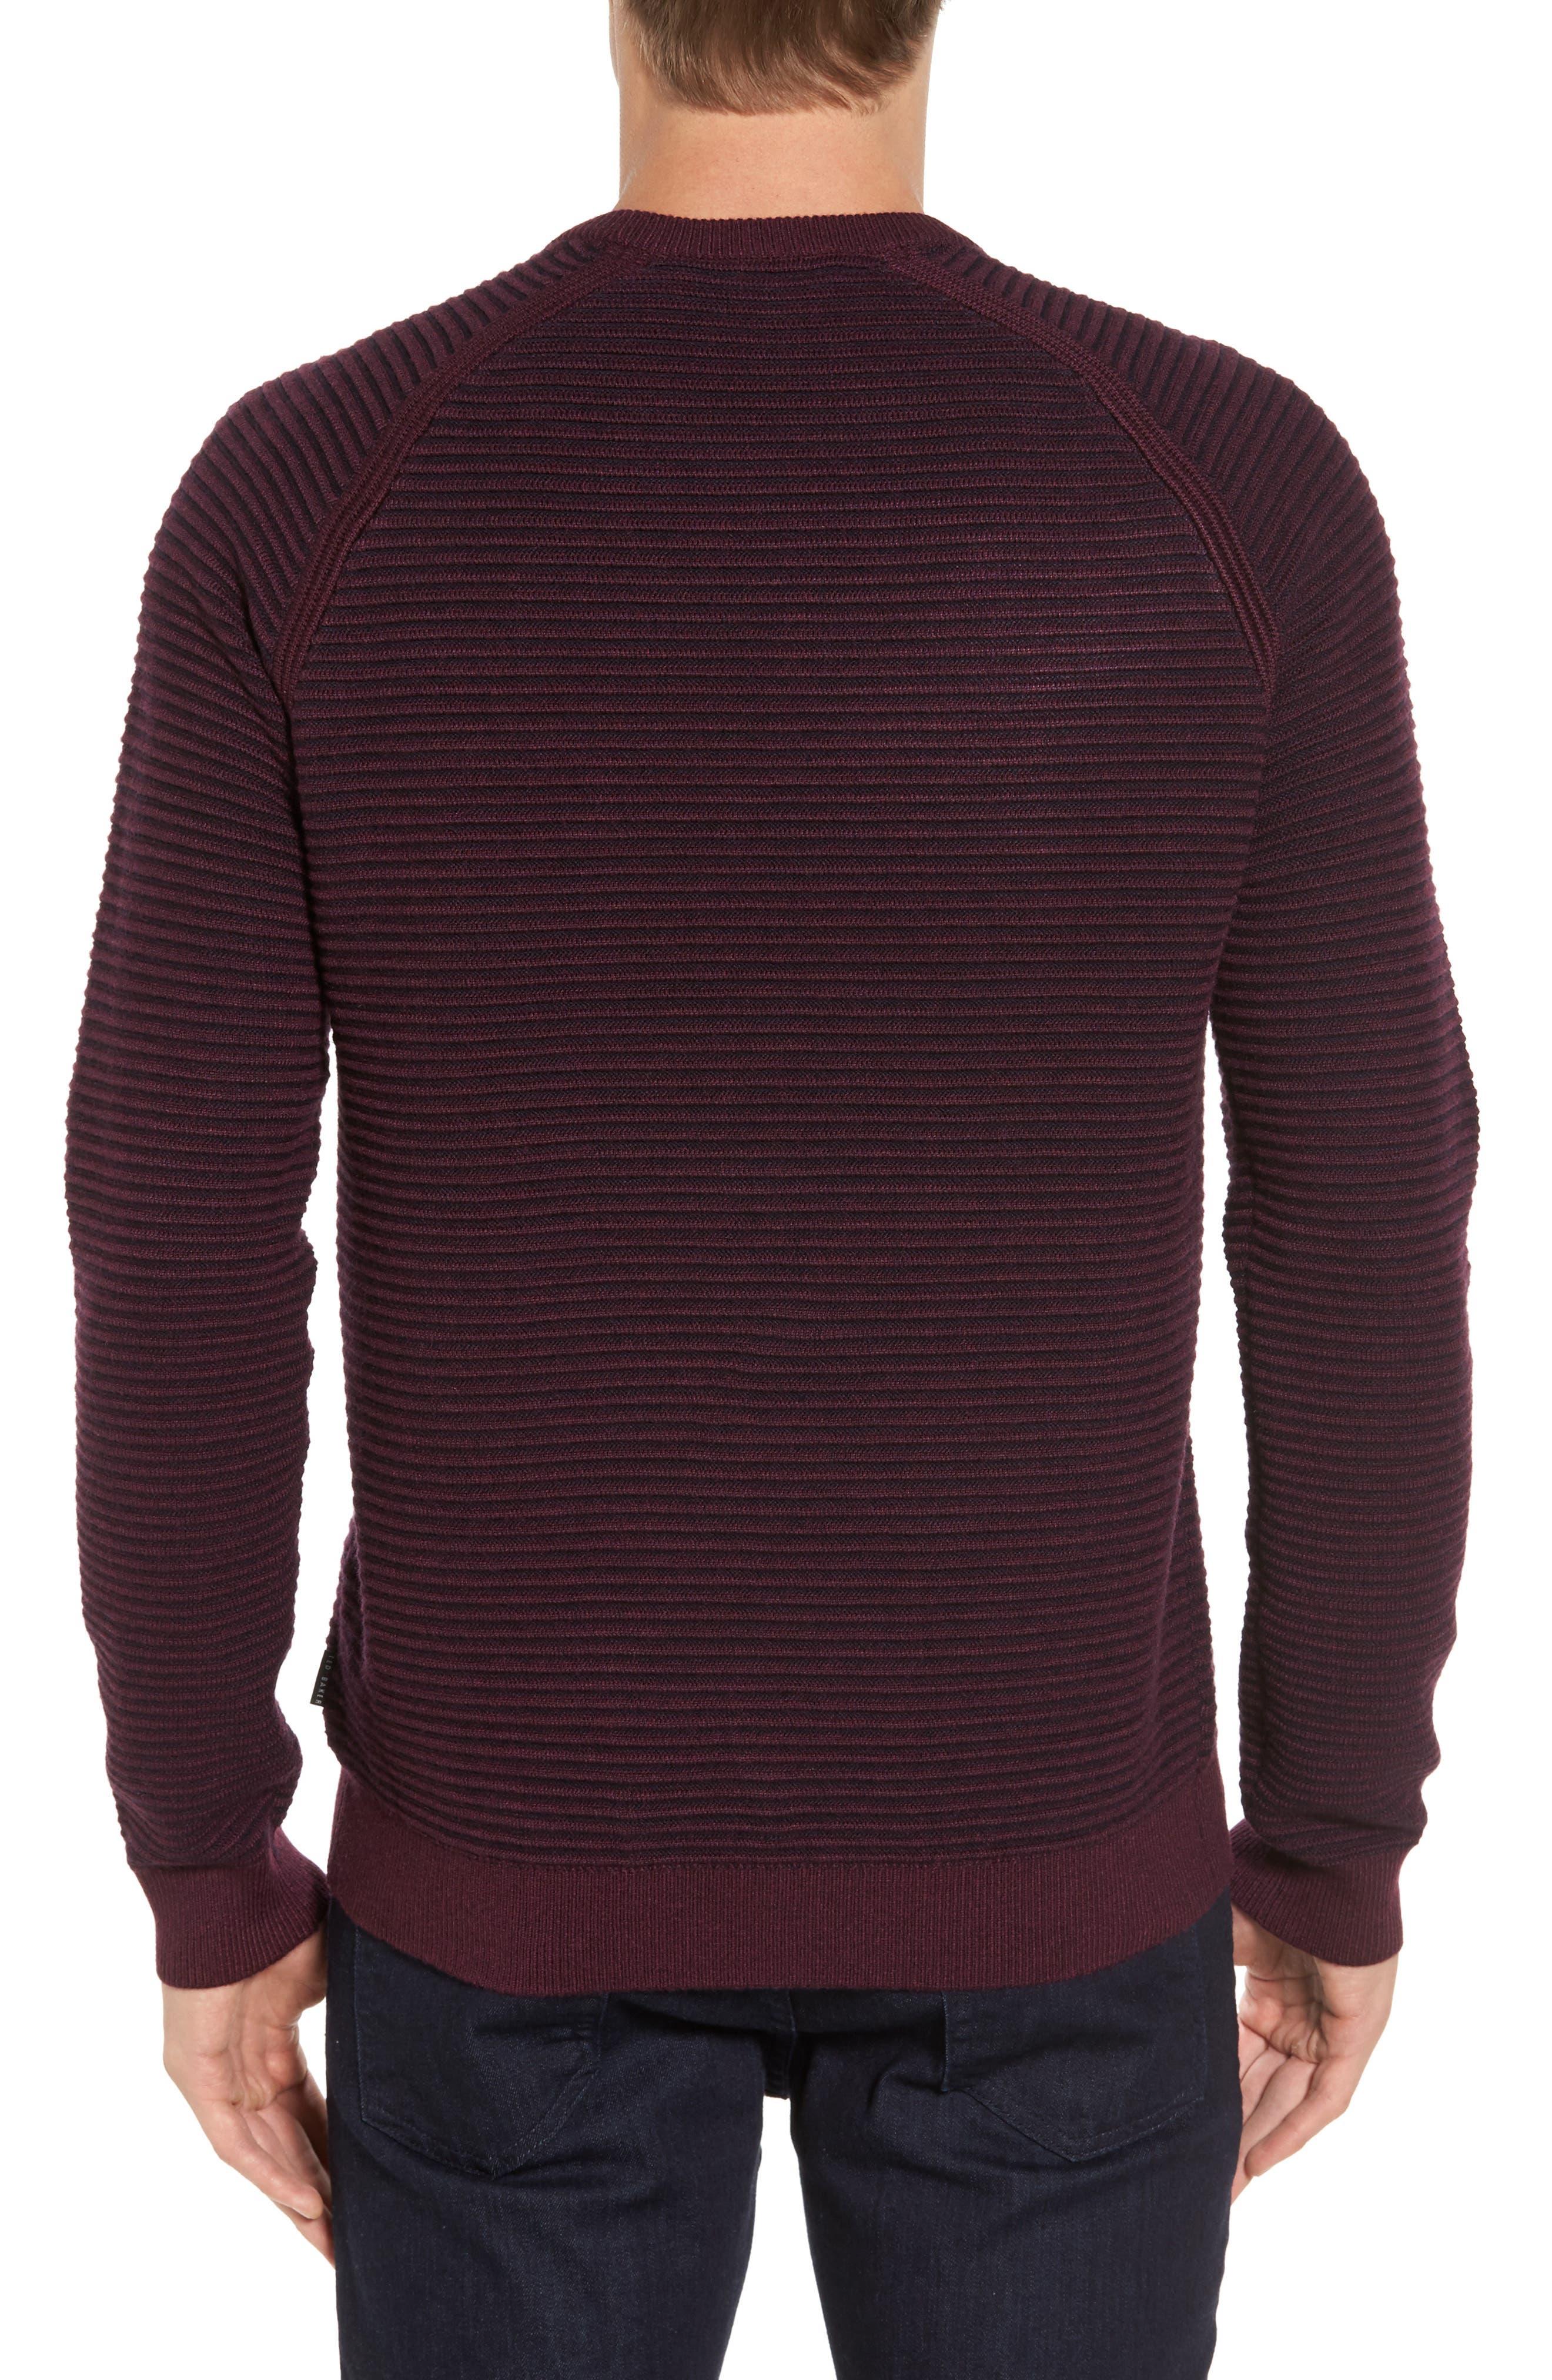 Cashoo Slim Fit Ribbed Sweatshirt,                             Alternate thumbnail 2, color,                             Purple